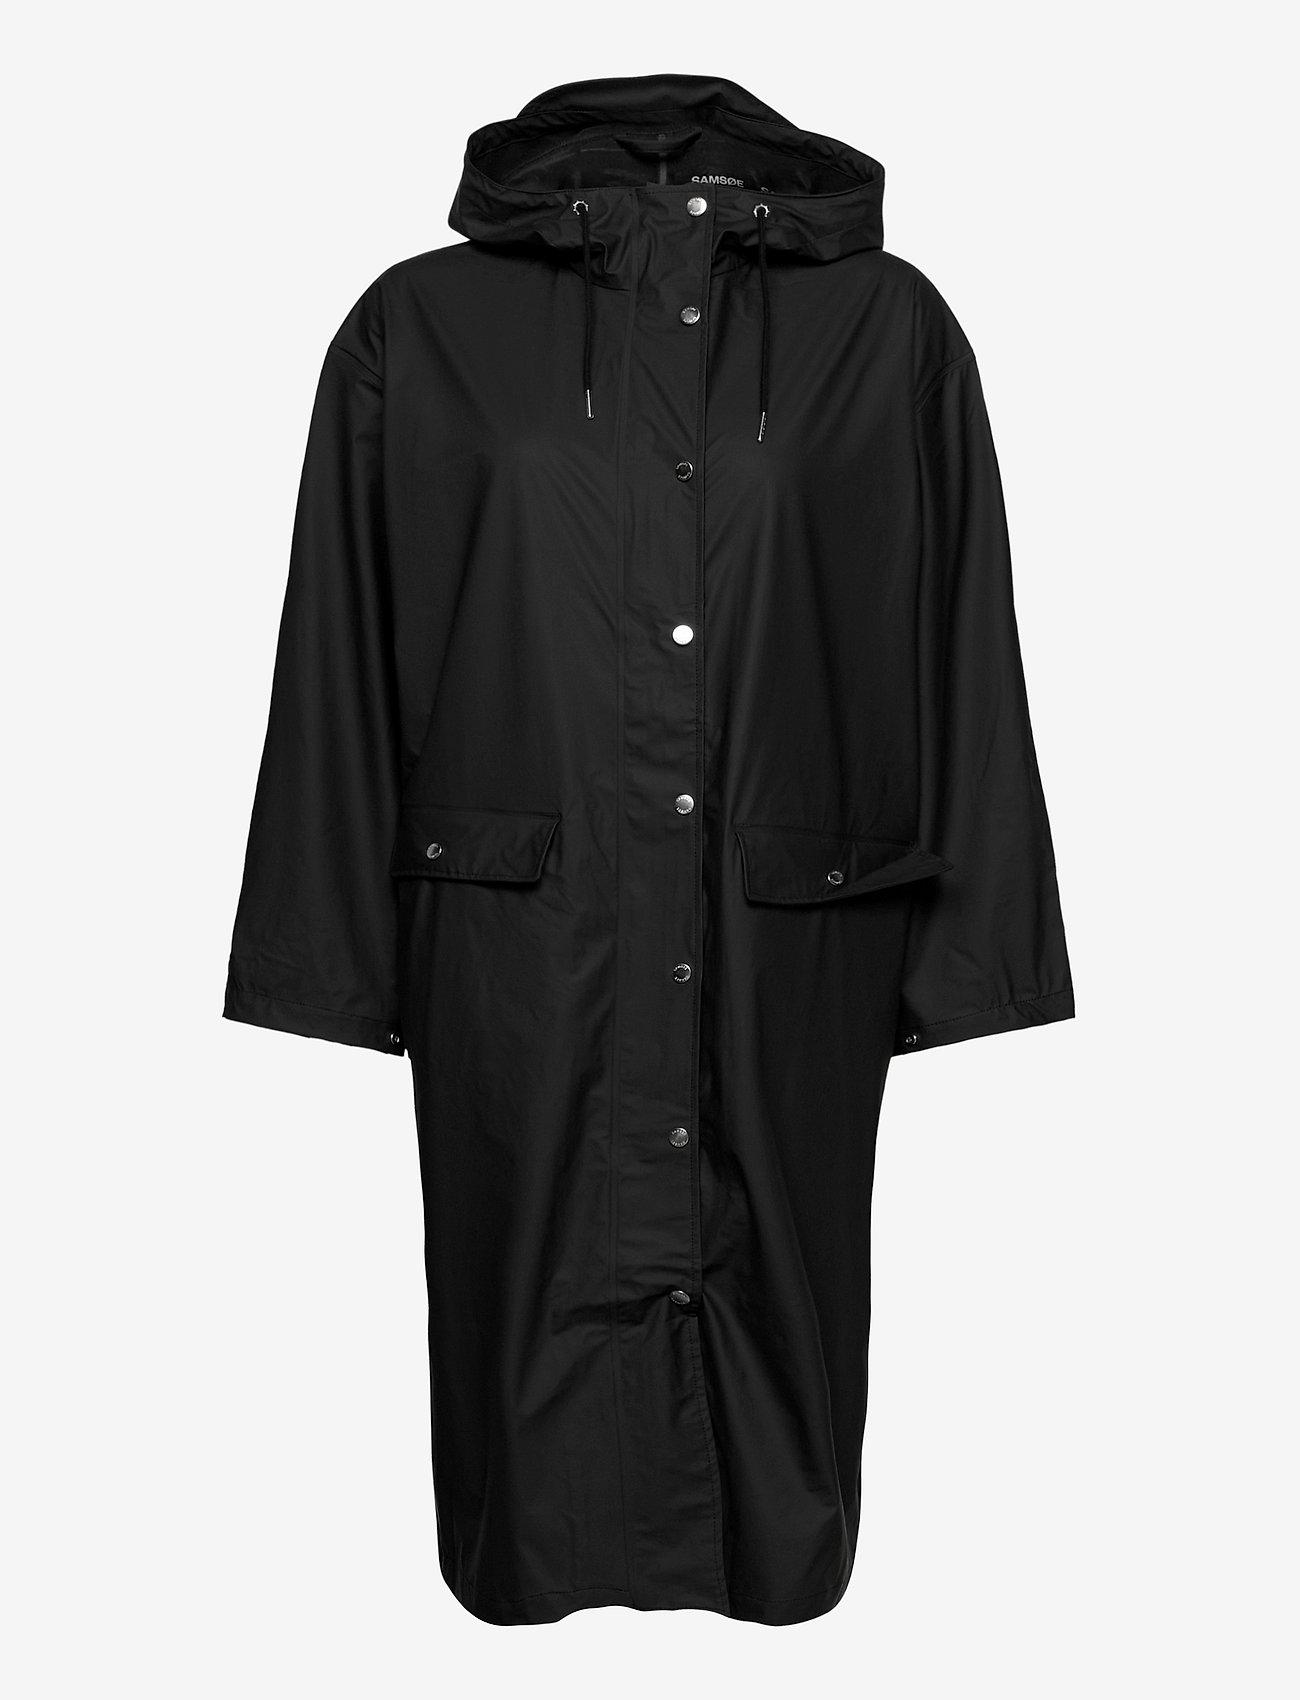 Samsøe Samsøe - Stala long jacket 7357 - manteaux de pluie - black - 1